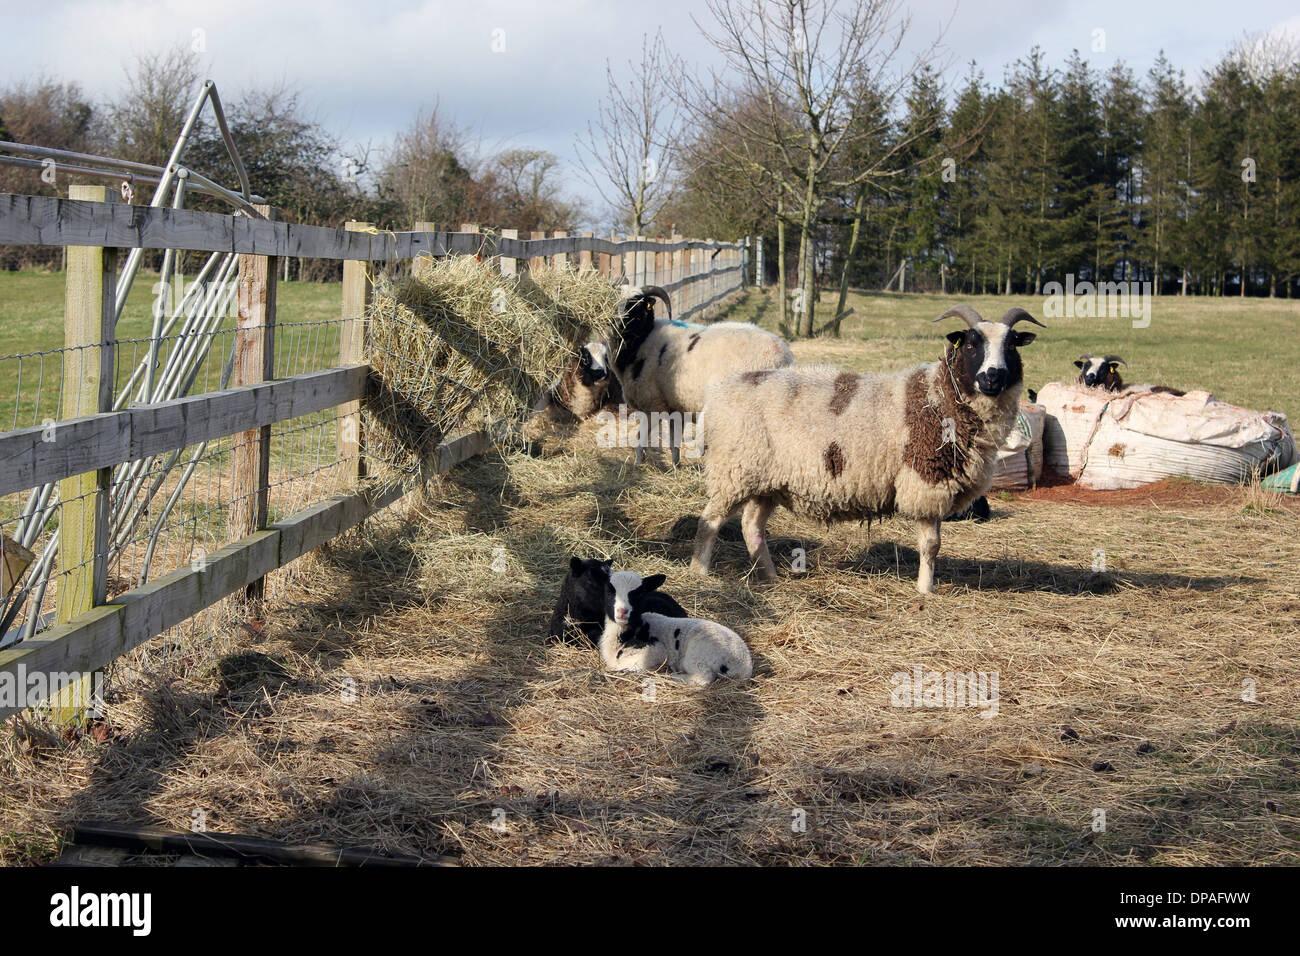 Jacob sheep with their lambs - Stock Image